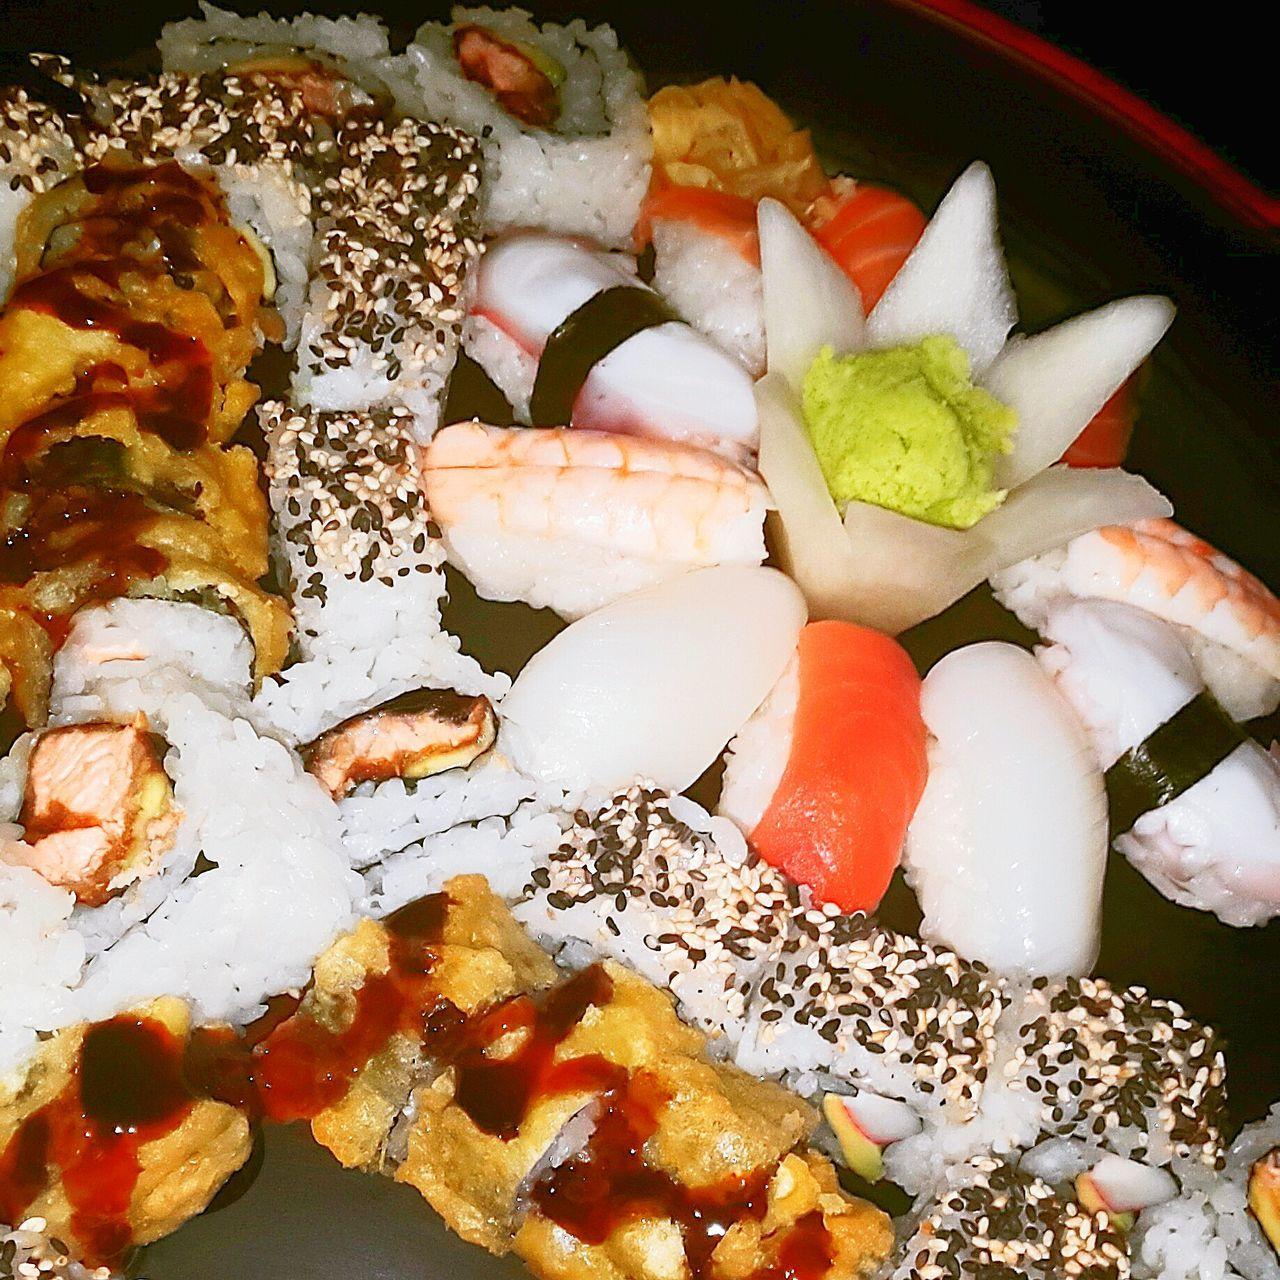 Sushi Sushi Time Sashimi Dinner Sashimi Dish Sashimilovers Sushi Love Sushi Restaurant Sushilover Sushi Maki Maki Sushitei Japanese Food Japanese Culture